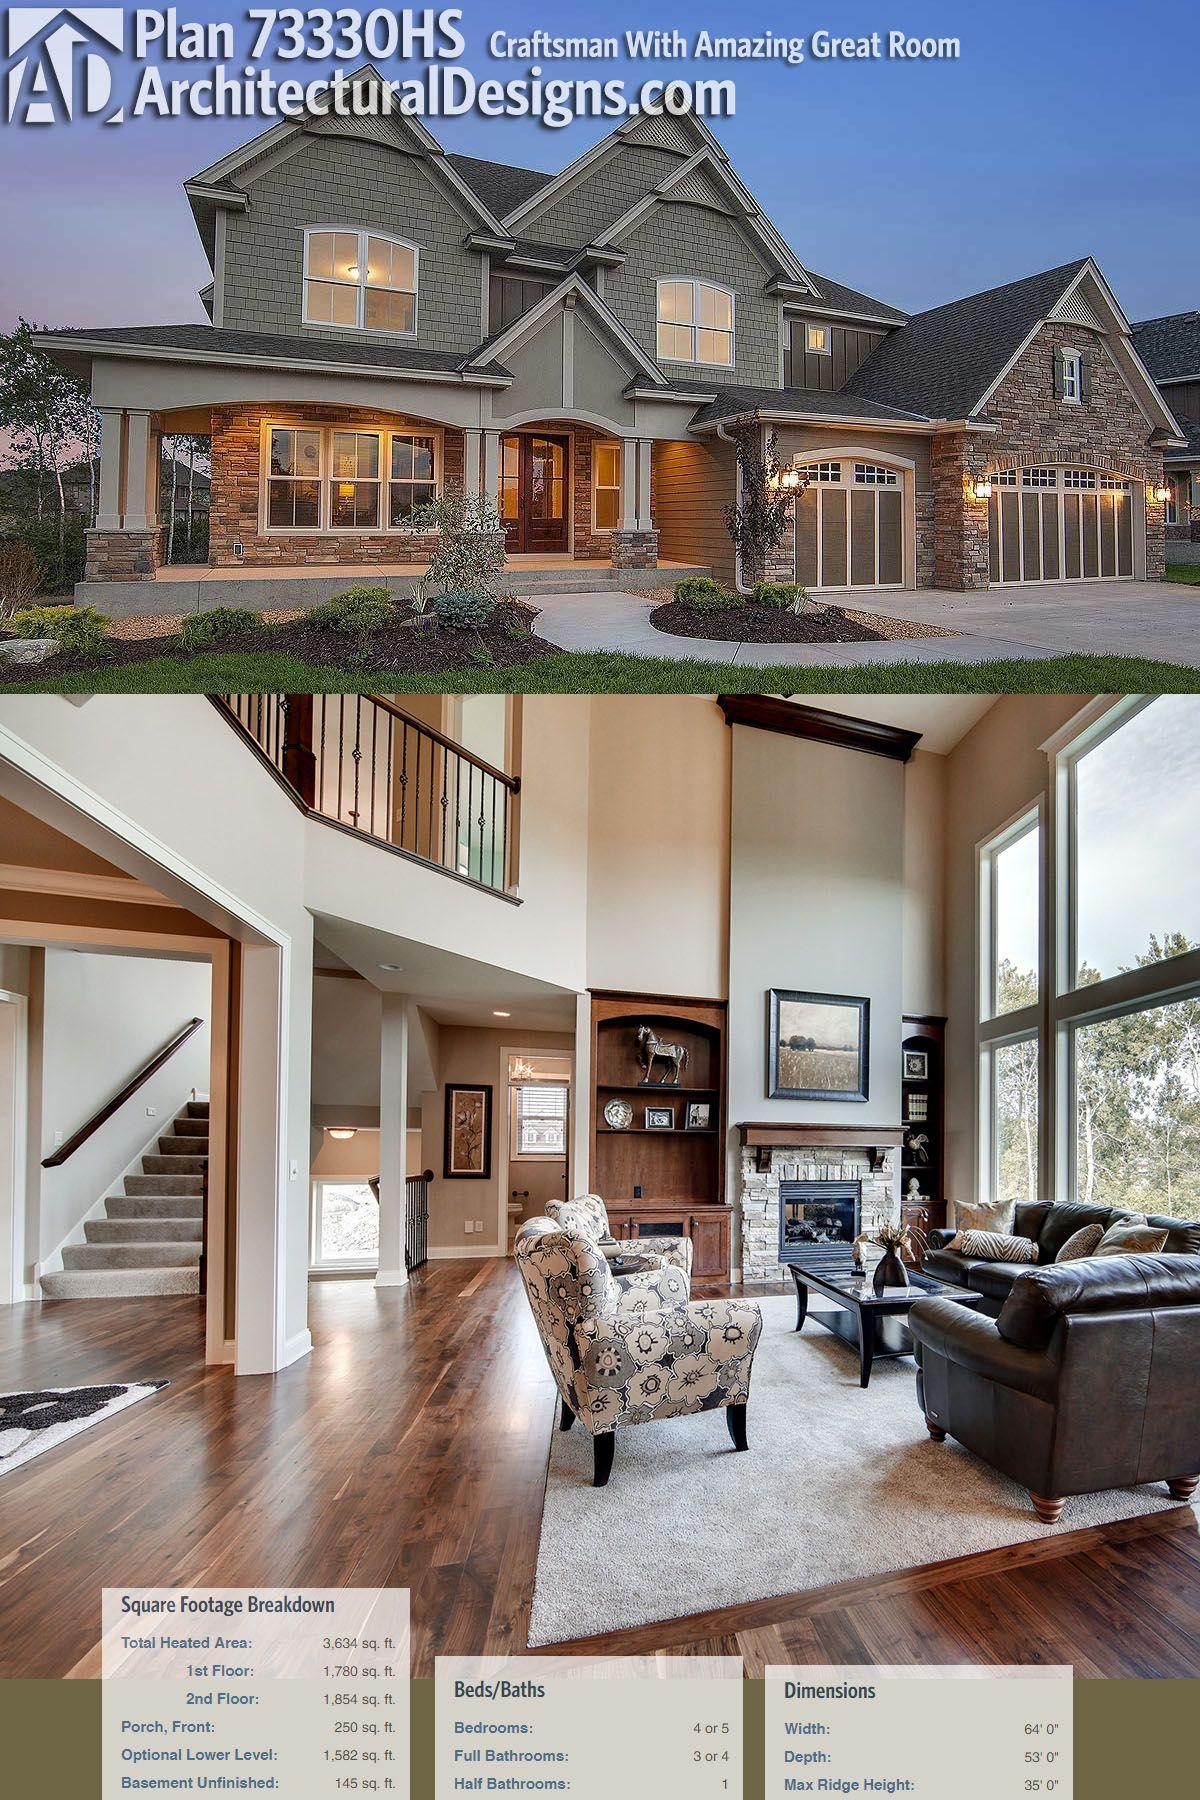 Architectural Designs Exclusive Craftsman House Plan 73330HS